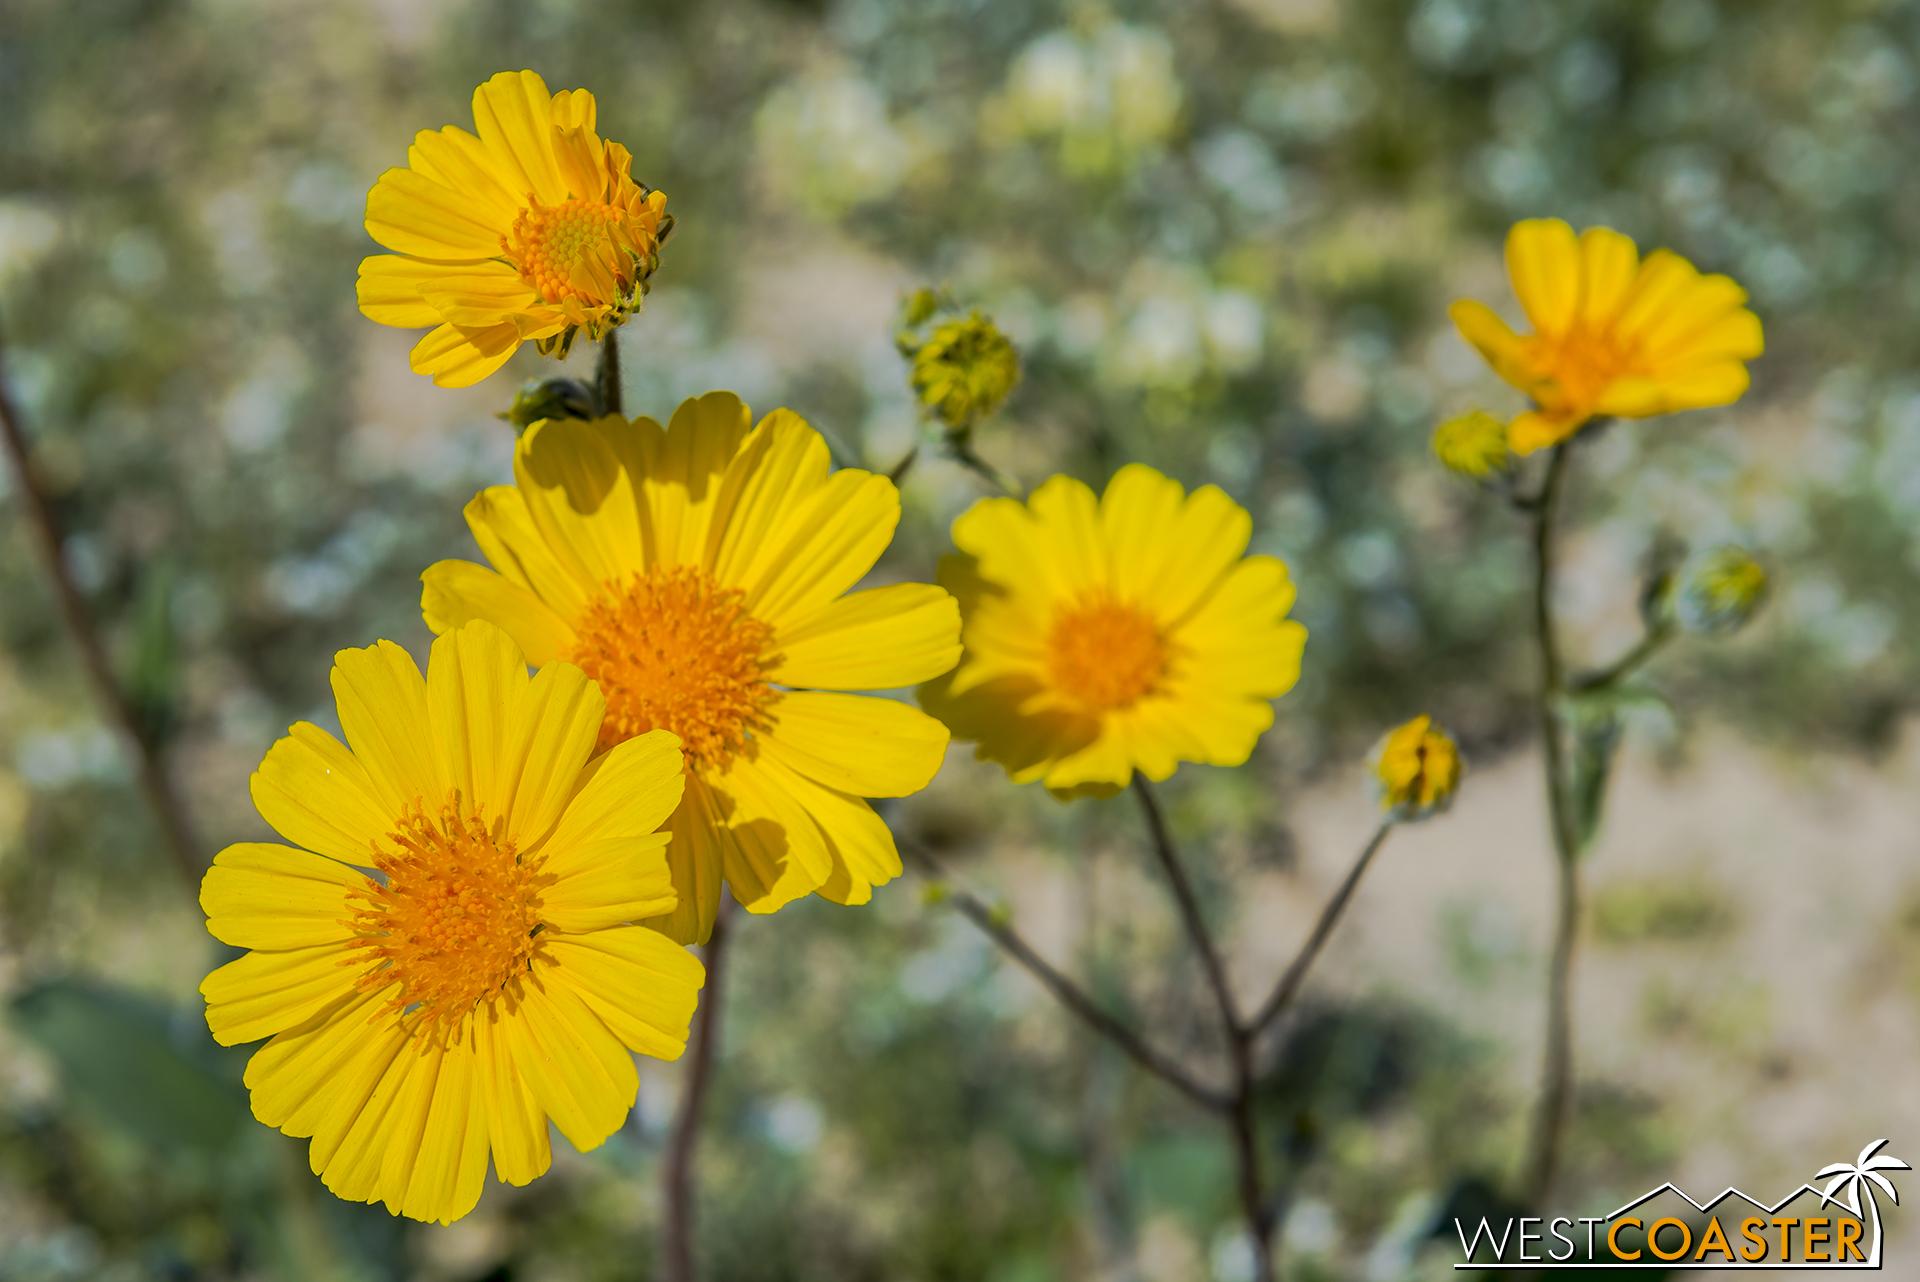 Desert sunflowers up close.